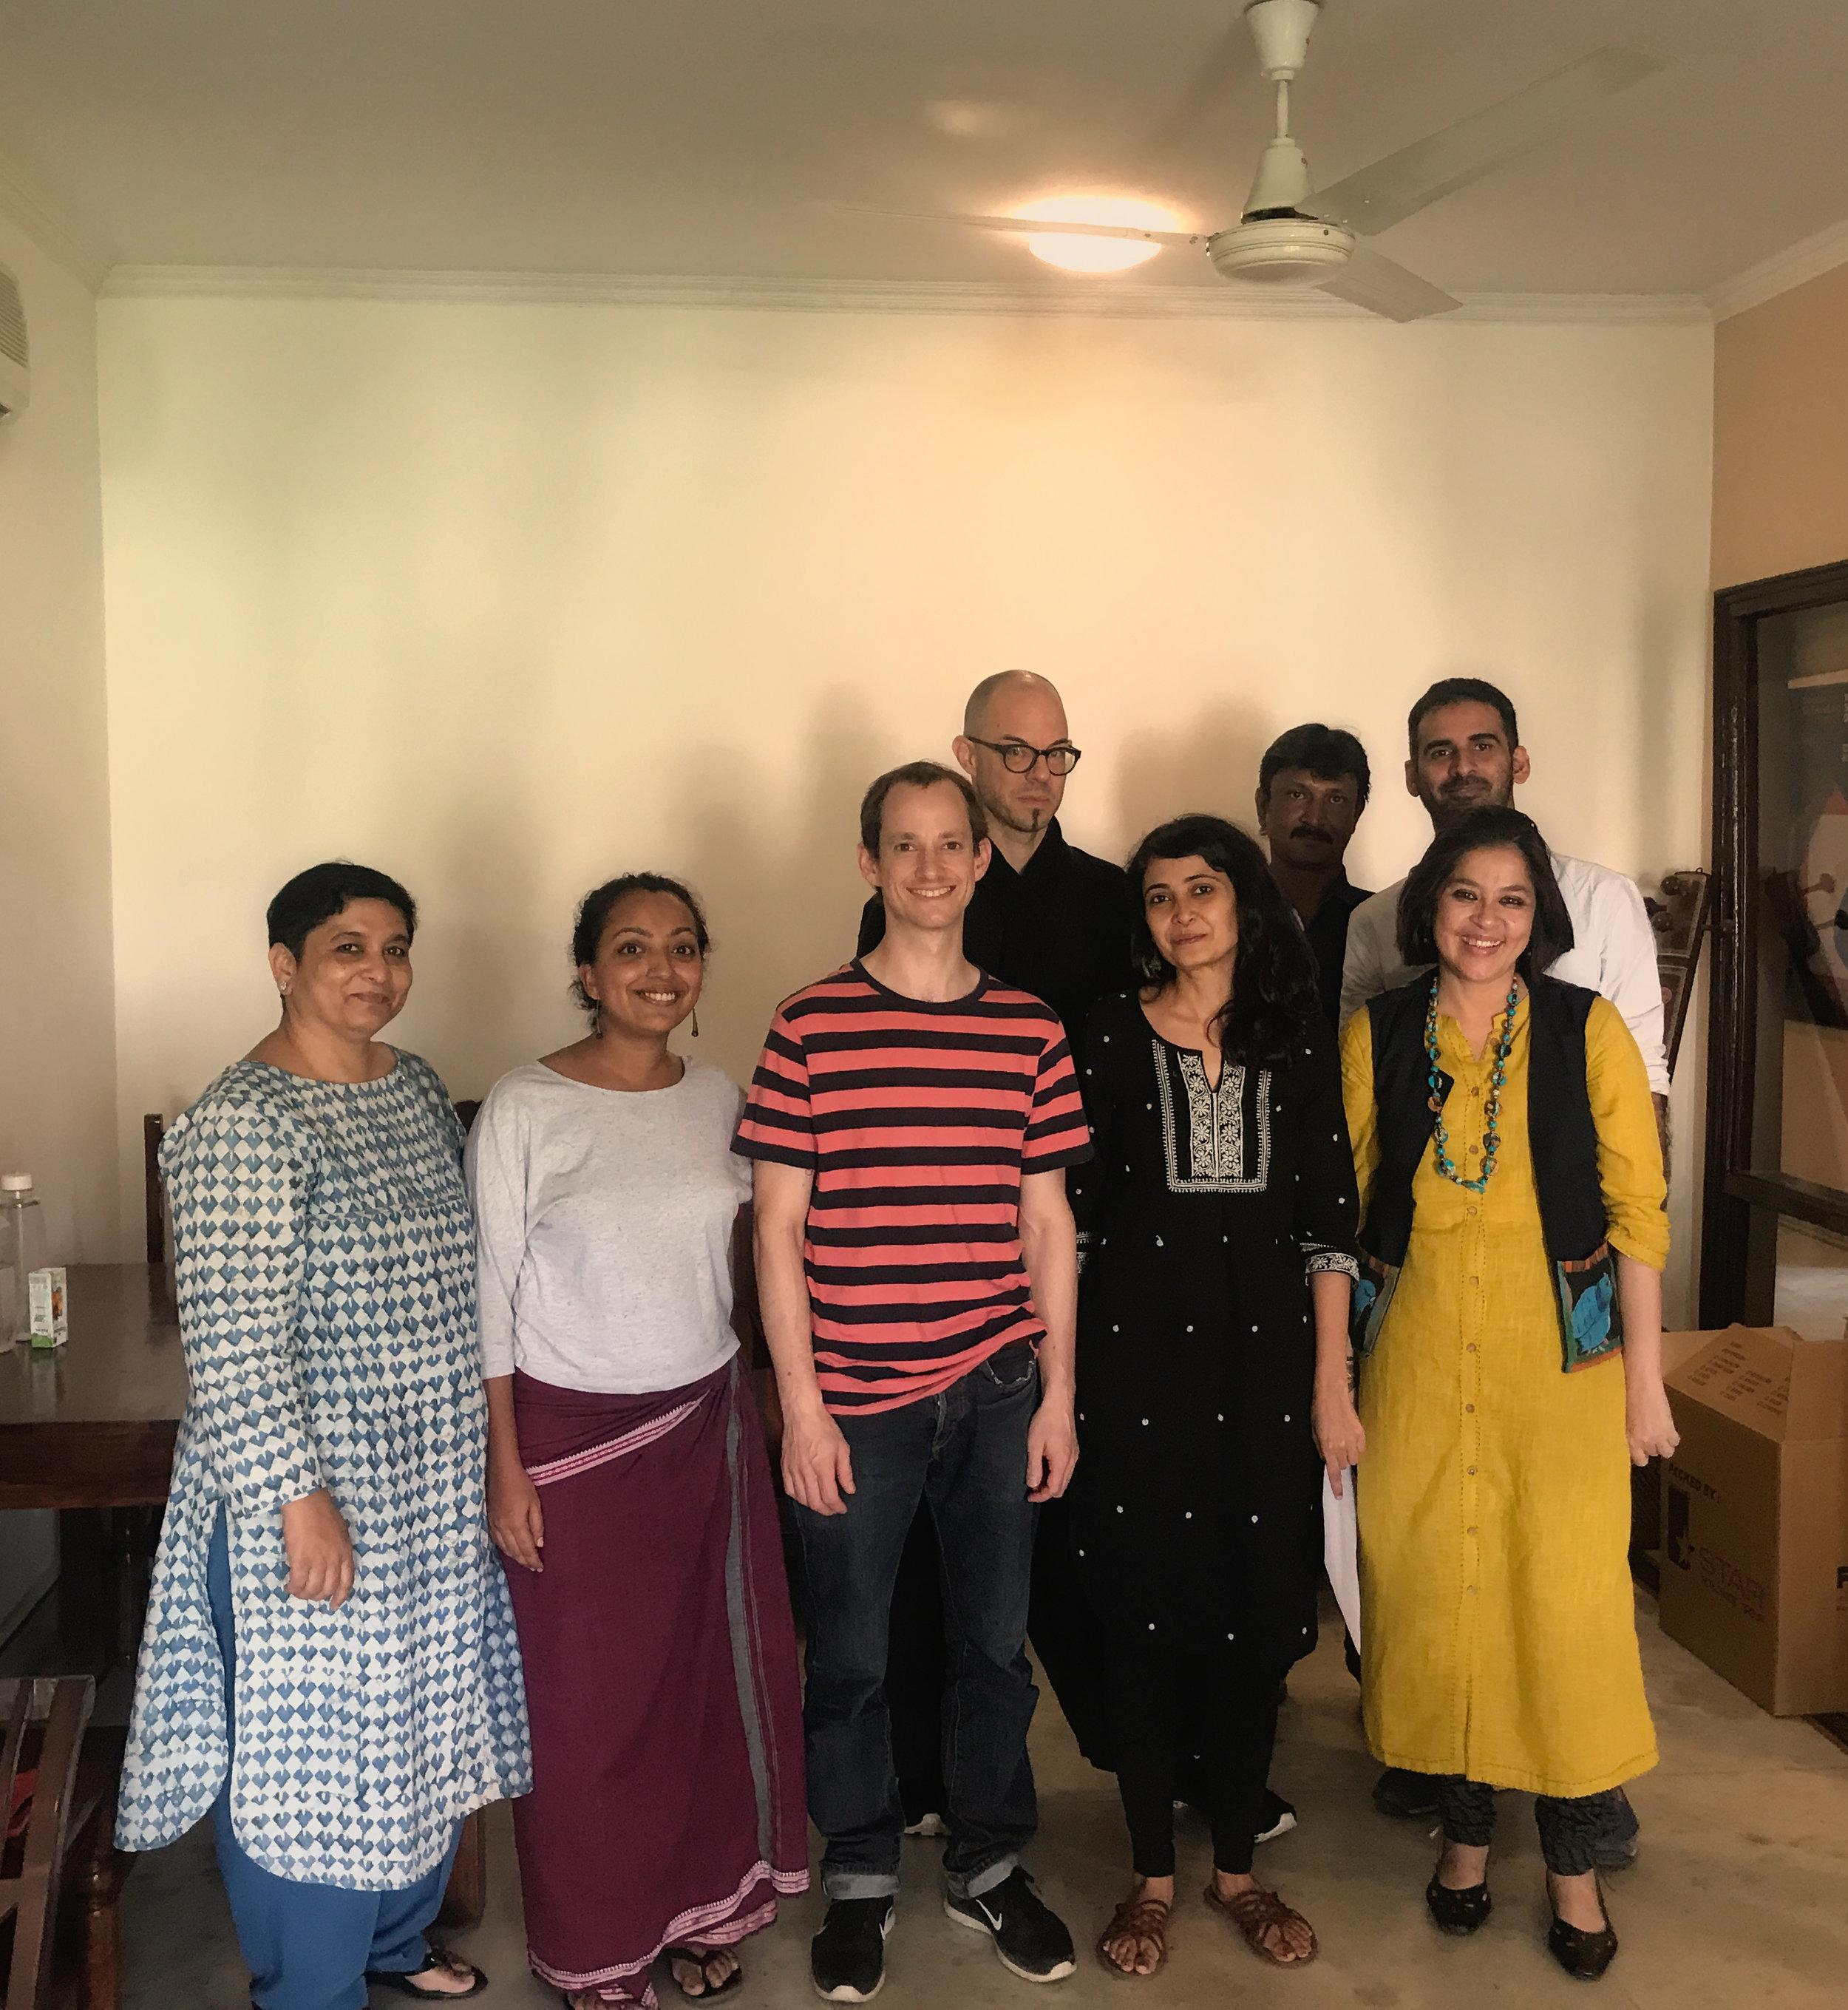 At the ProHelvetia Office in New Delhi (in the back: Nik Bärtsch, Puneet Kumar, Akshay Pathak/ in the front: Sangeeta Rana, Tanima Maniktala, Lukas Baumgartner, Sadaf Raza, Minhazz Mazumdar)